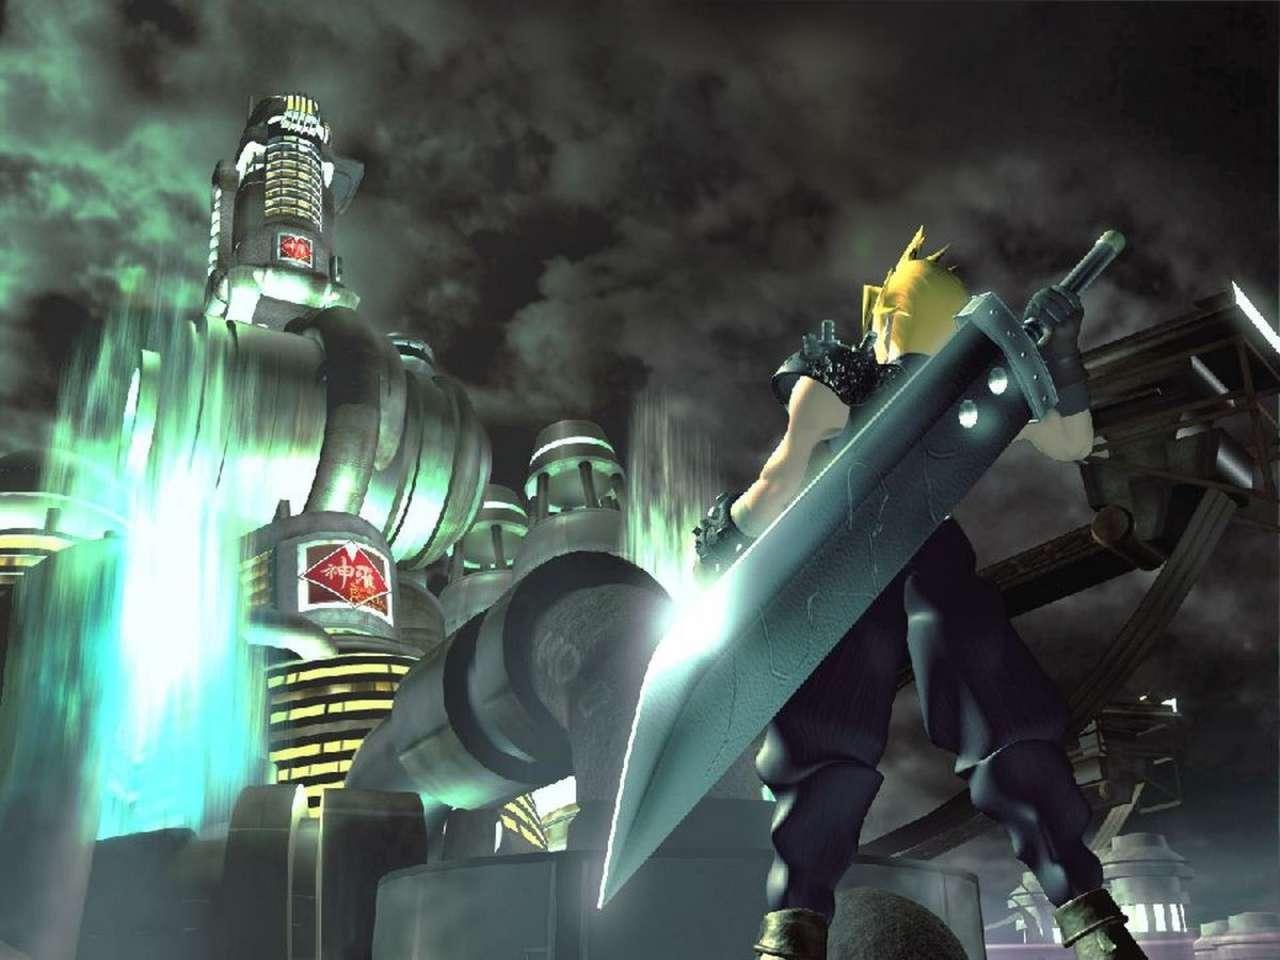 8. Buster Sword - Final Fantasy VII